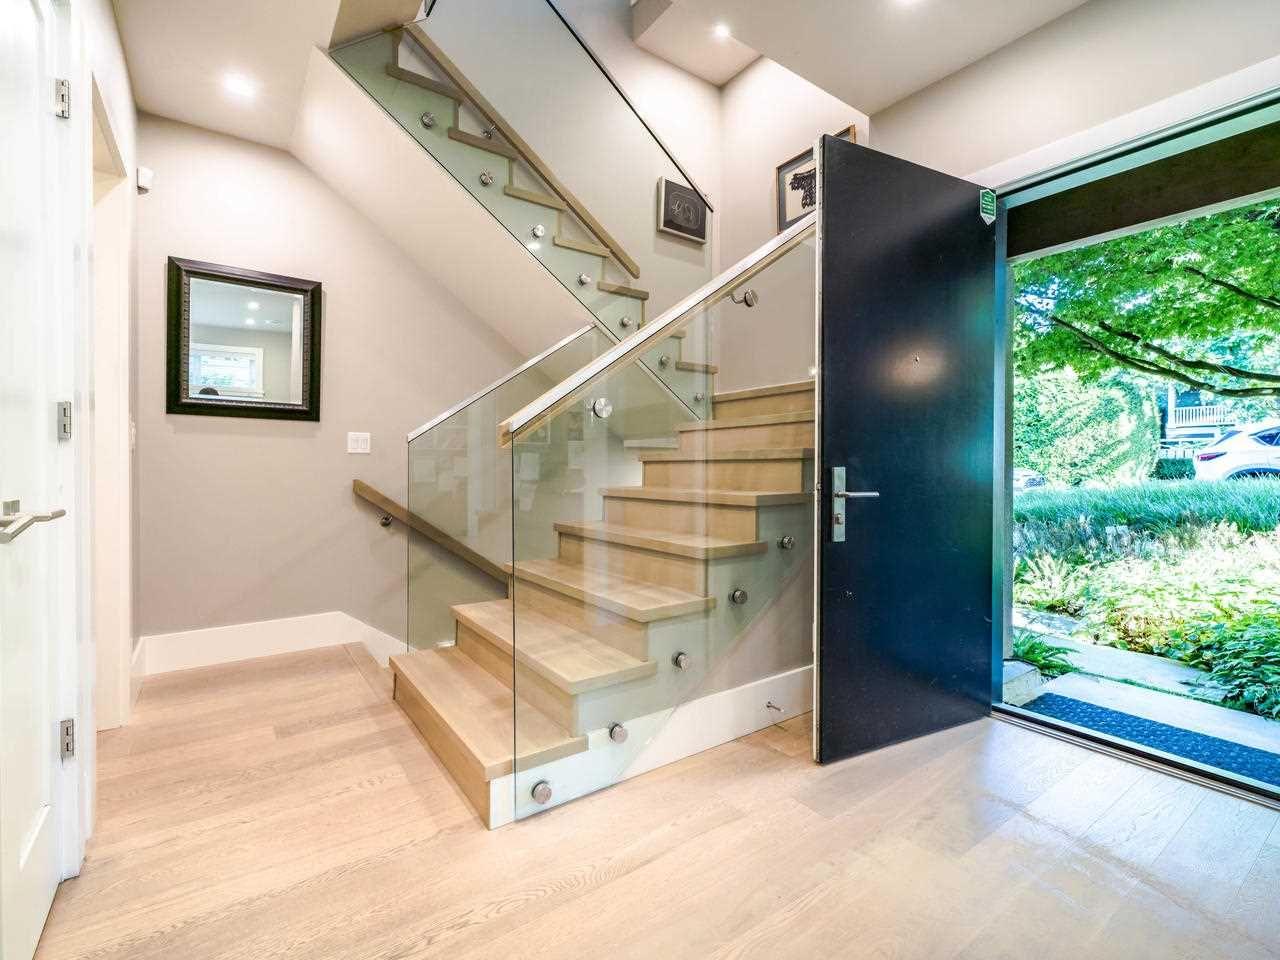 Main Photo: 2070 FULTON Avenue in West Vancouver: Ambleside 1/2 Duplex for sale : MLS®# R2488830